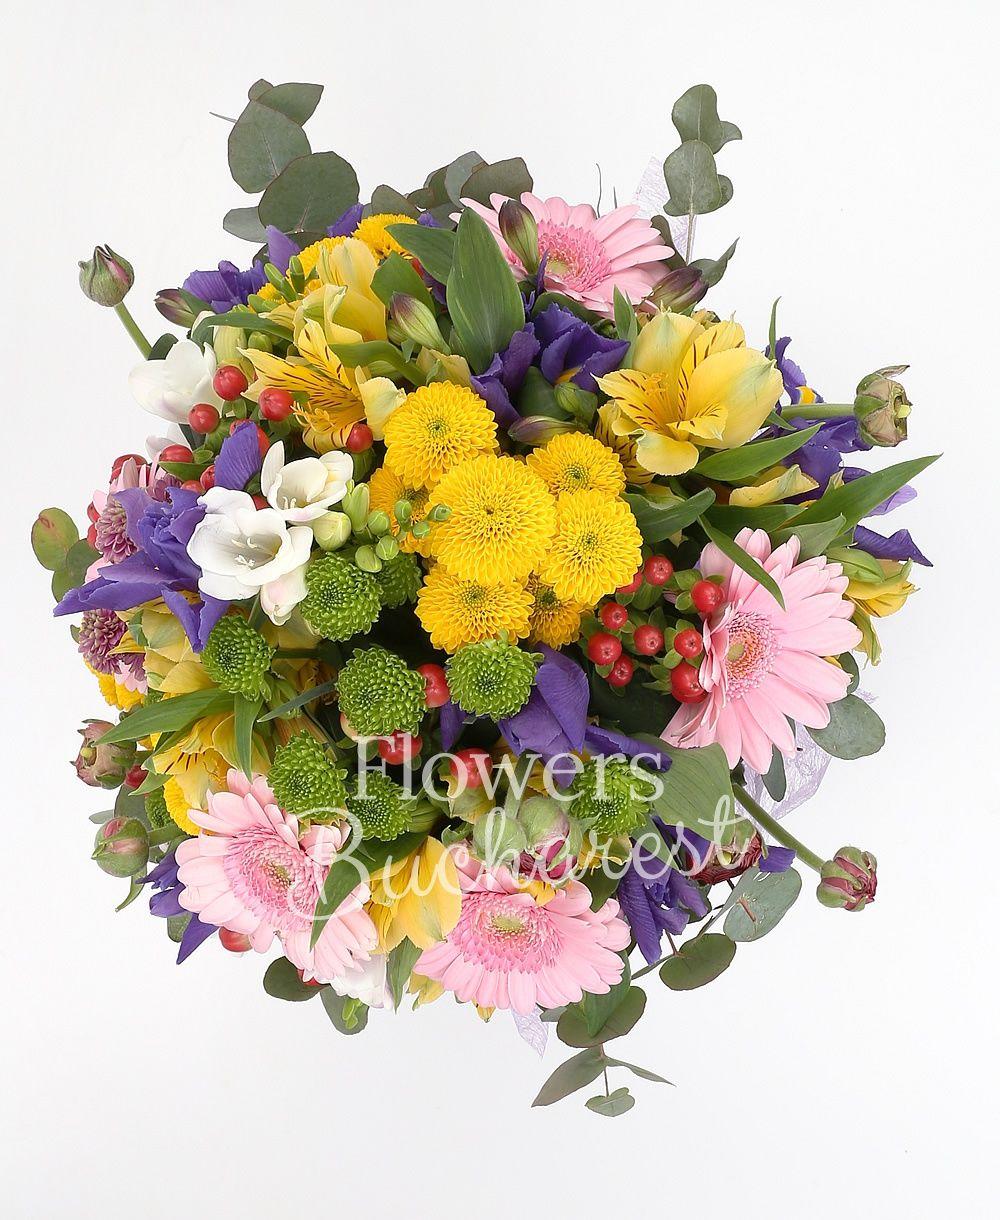 10 purple iris, 7 pink gerbera, 3 green santini, 2 pink santini, 3 yellow santini, 5 yellow alstroemeria, 5 red hypericum, 5 white freesias, greenery